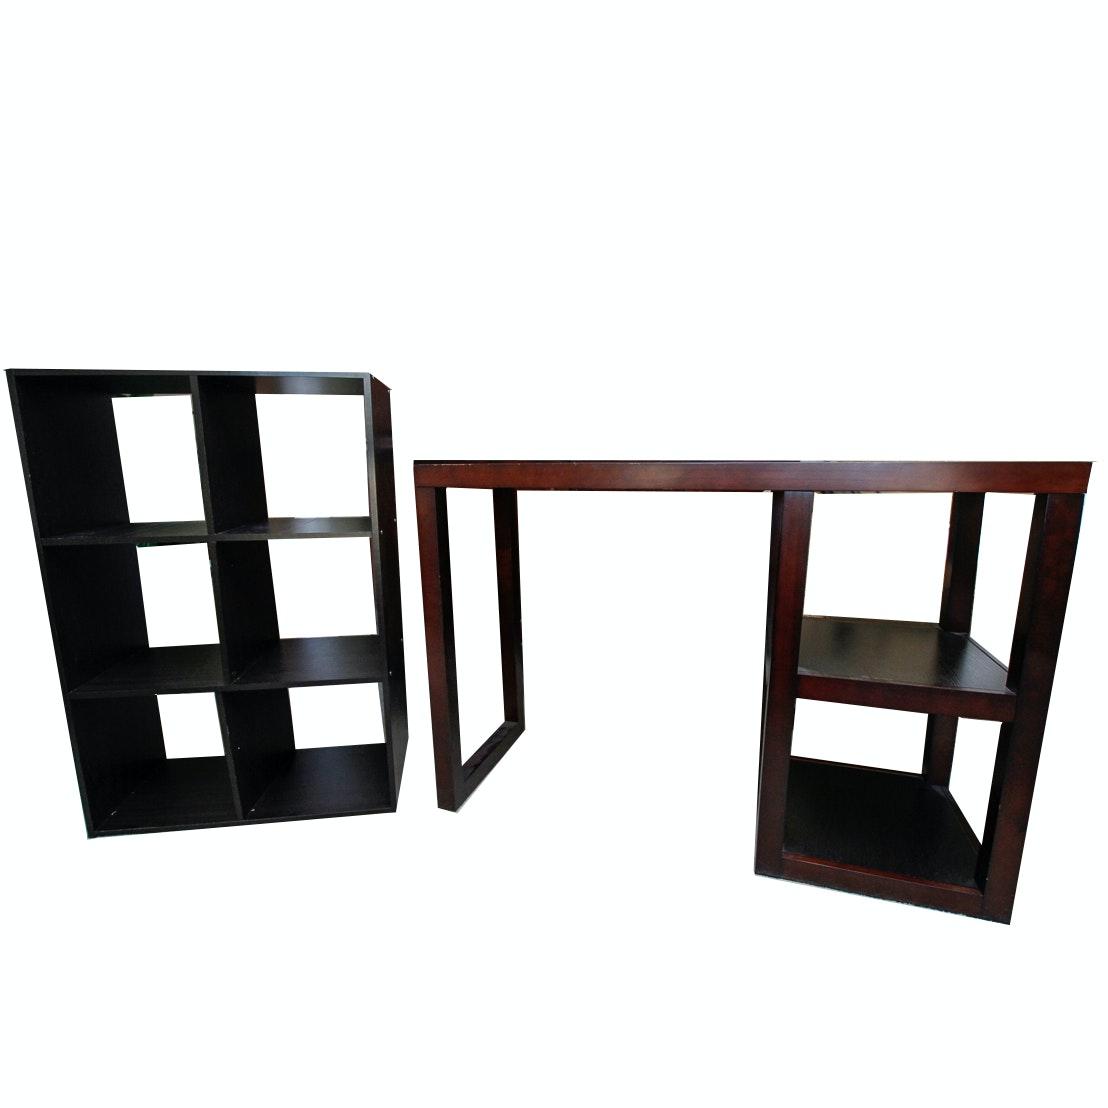 Contemporary Shelving Unit and Desk